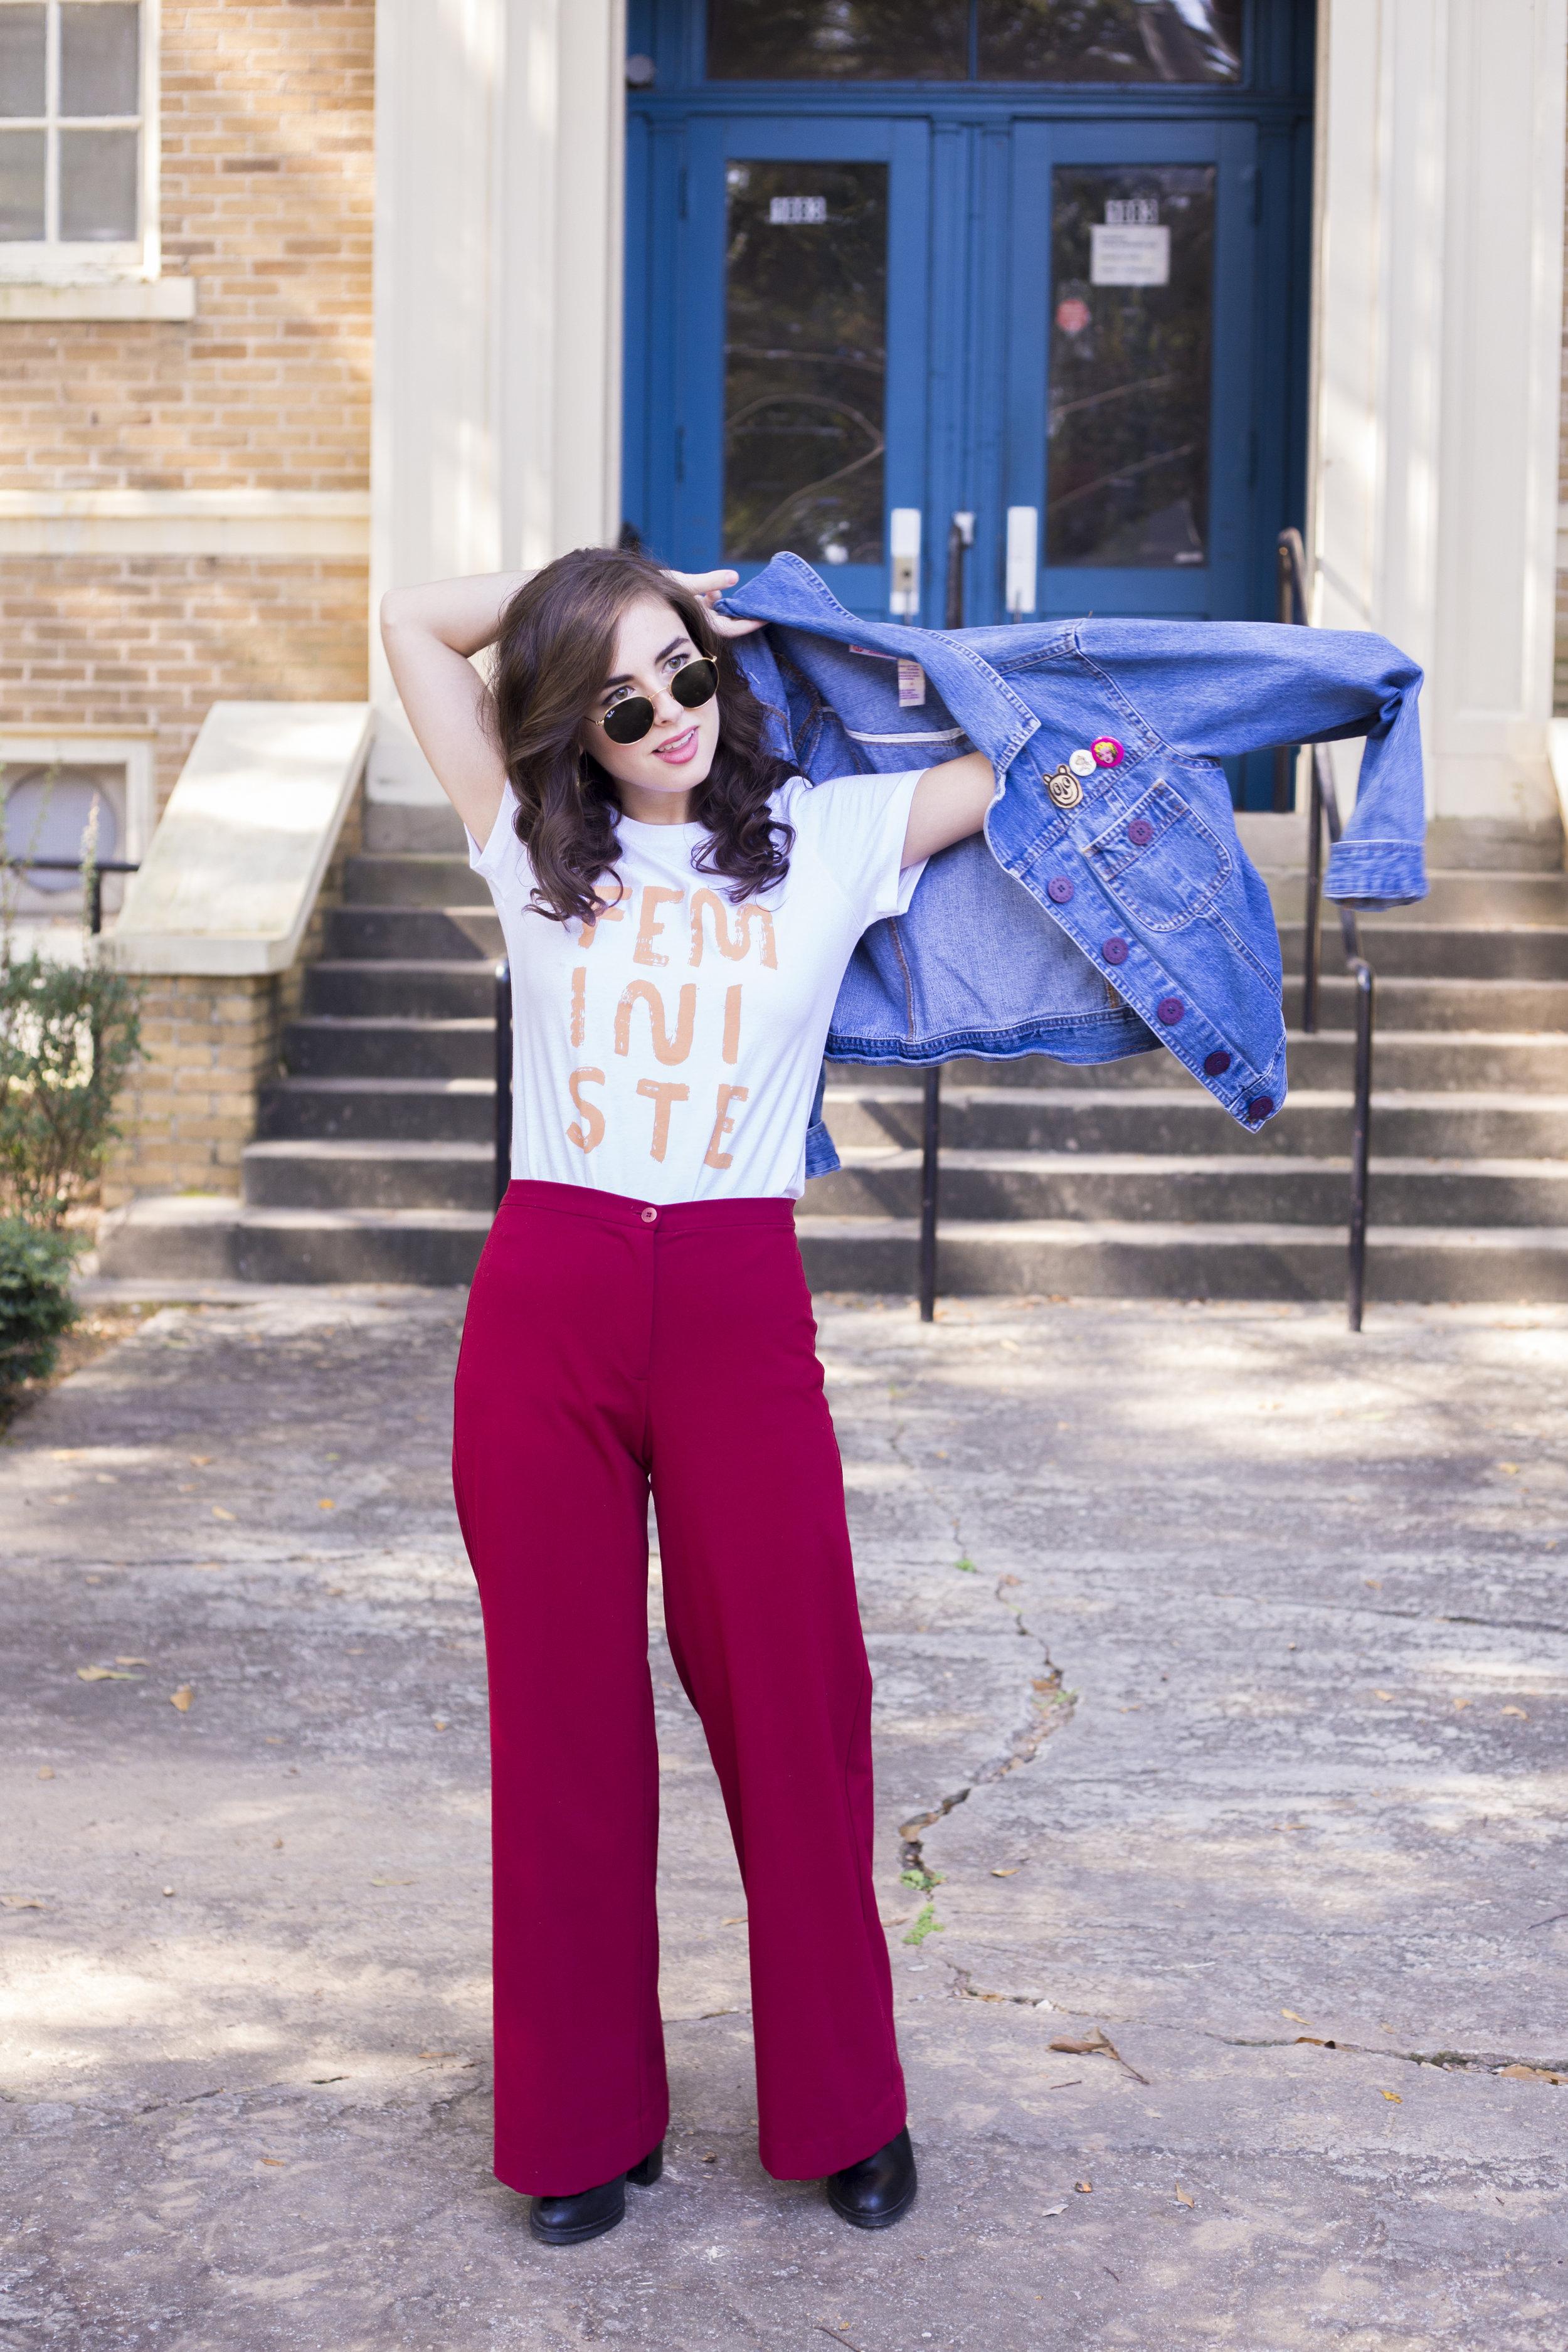 Shirt: People I've Loved; Pants: Banana Republic (via Goodwill); Jacket: Bill Blass (via Goodwill);  Sunglasses: Ray-Ban